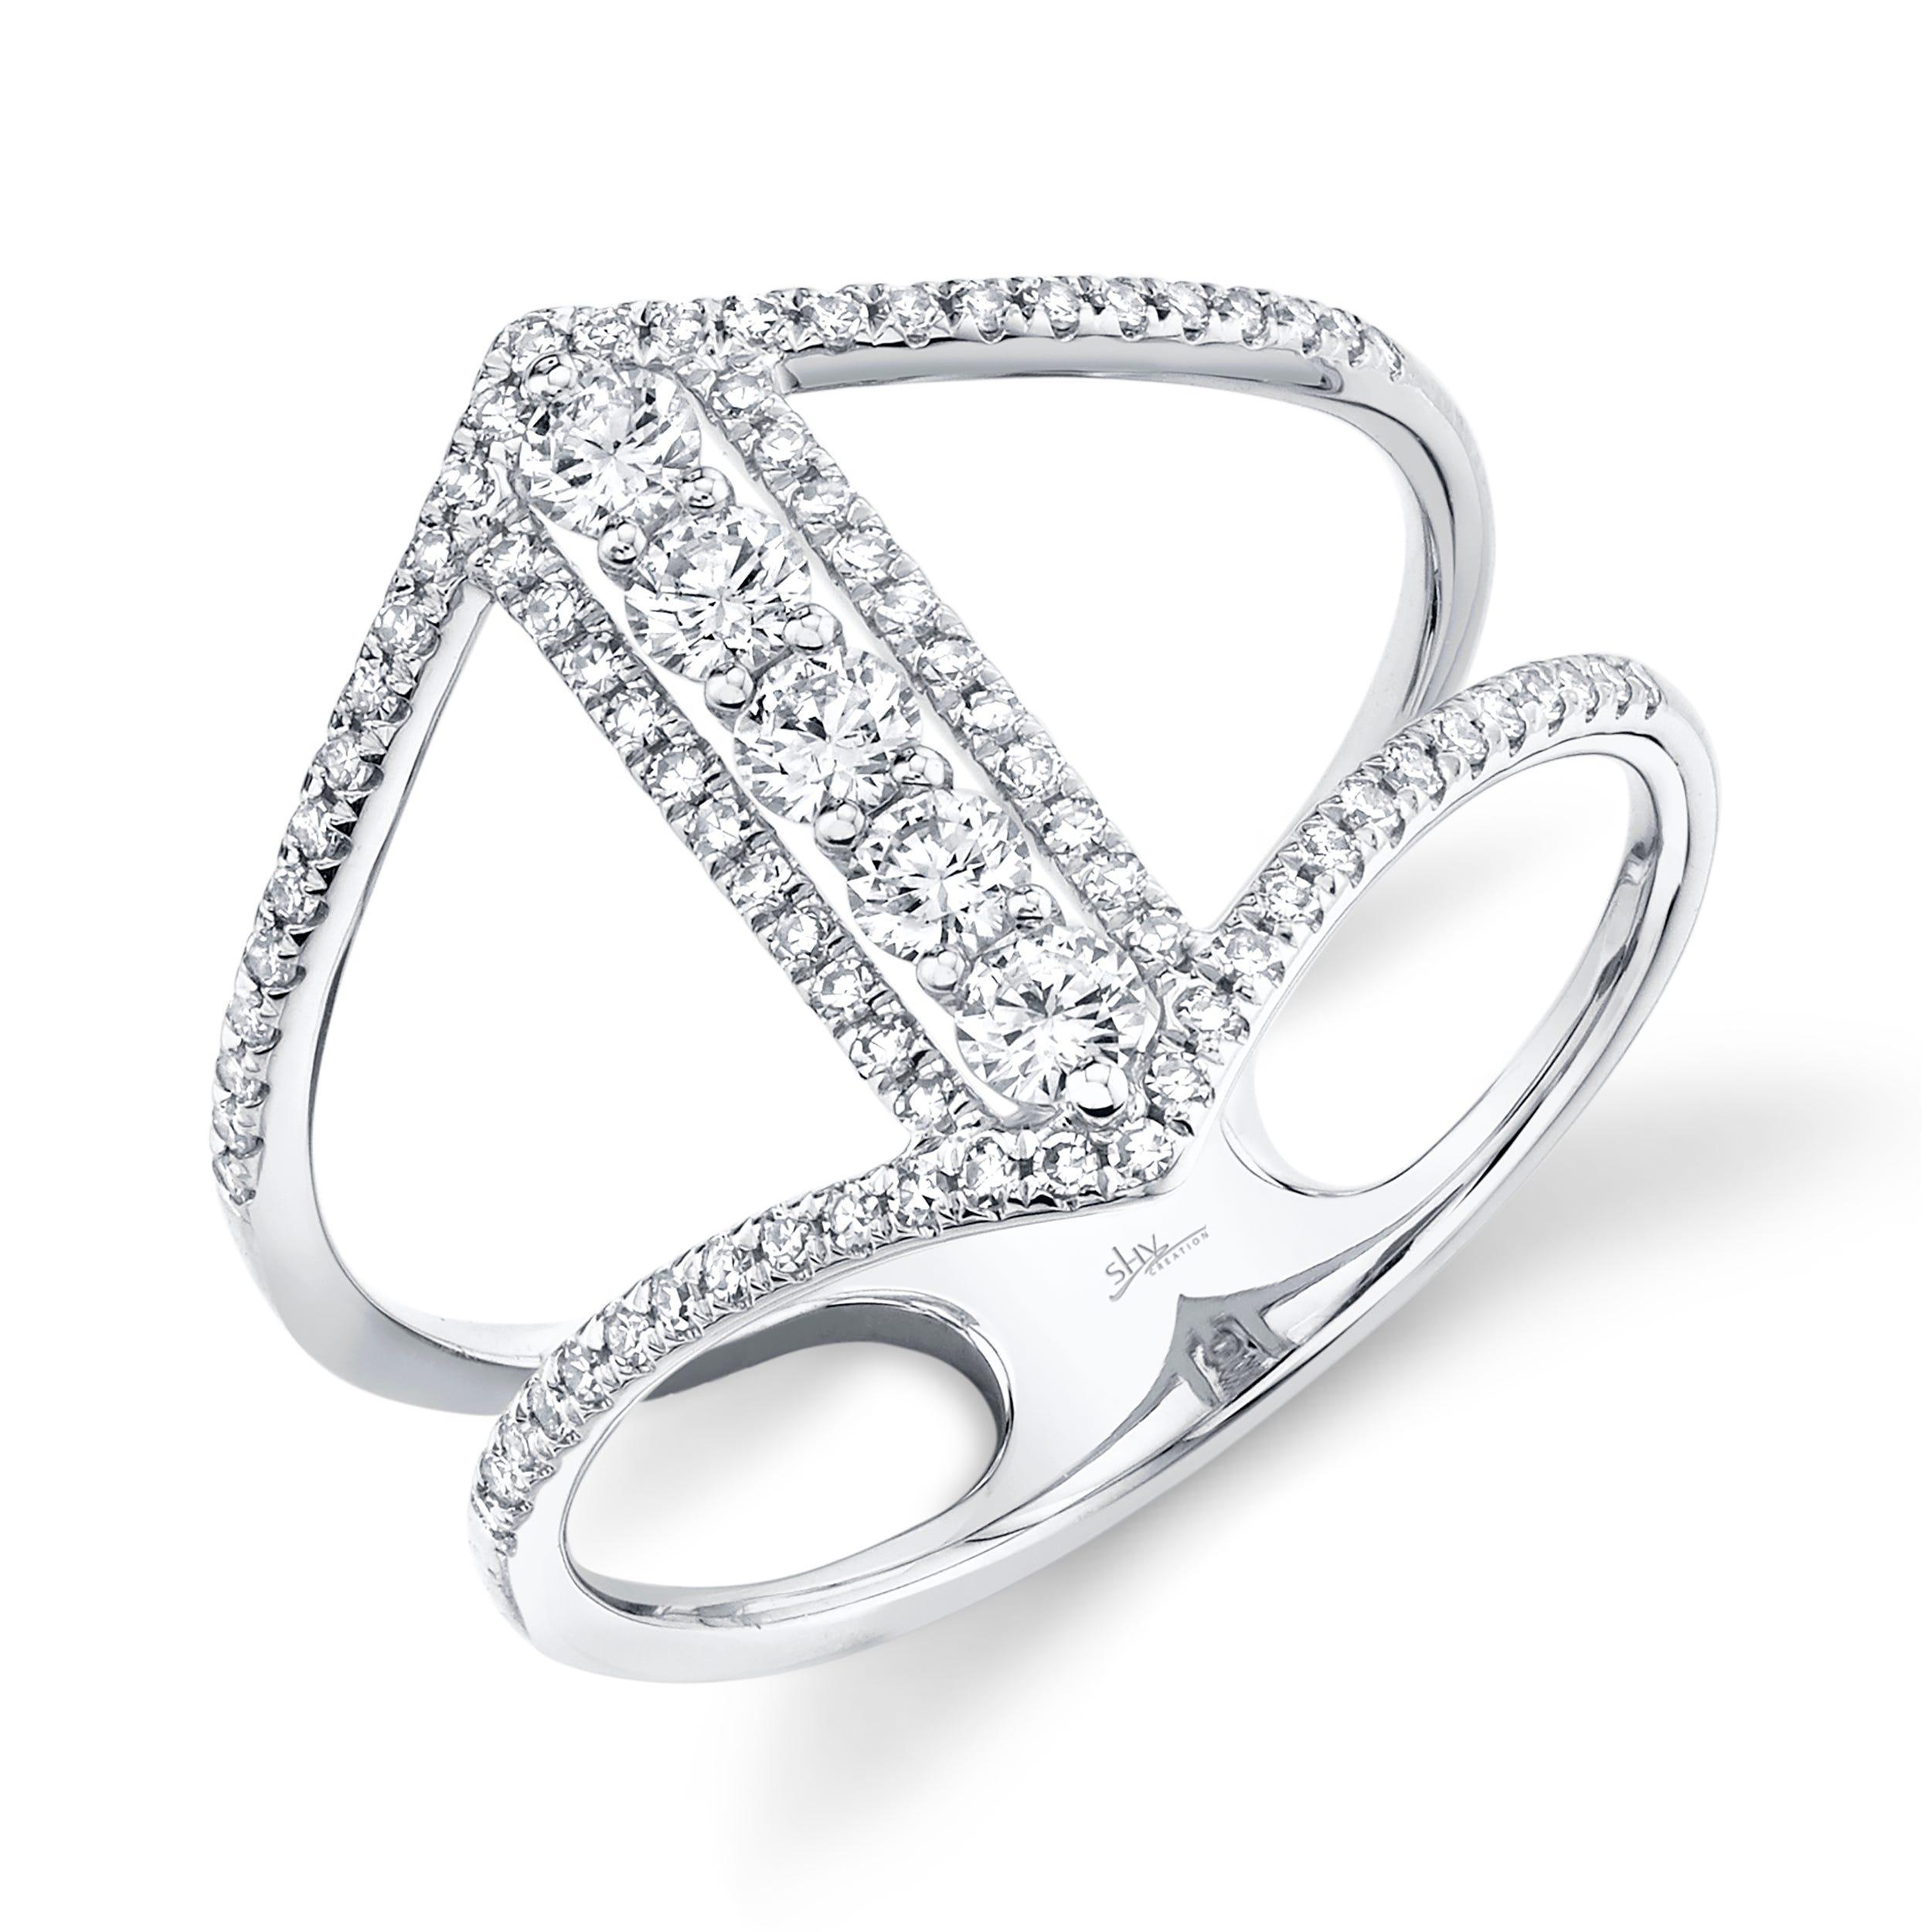 Shy Creation Diamond Open Bar Fashion Ring in 14k White Gold SC55005463